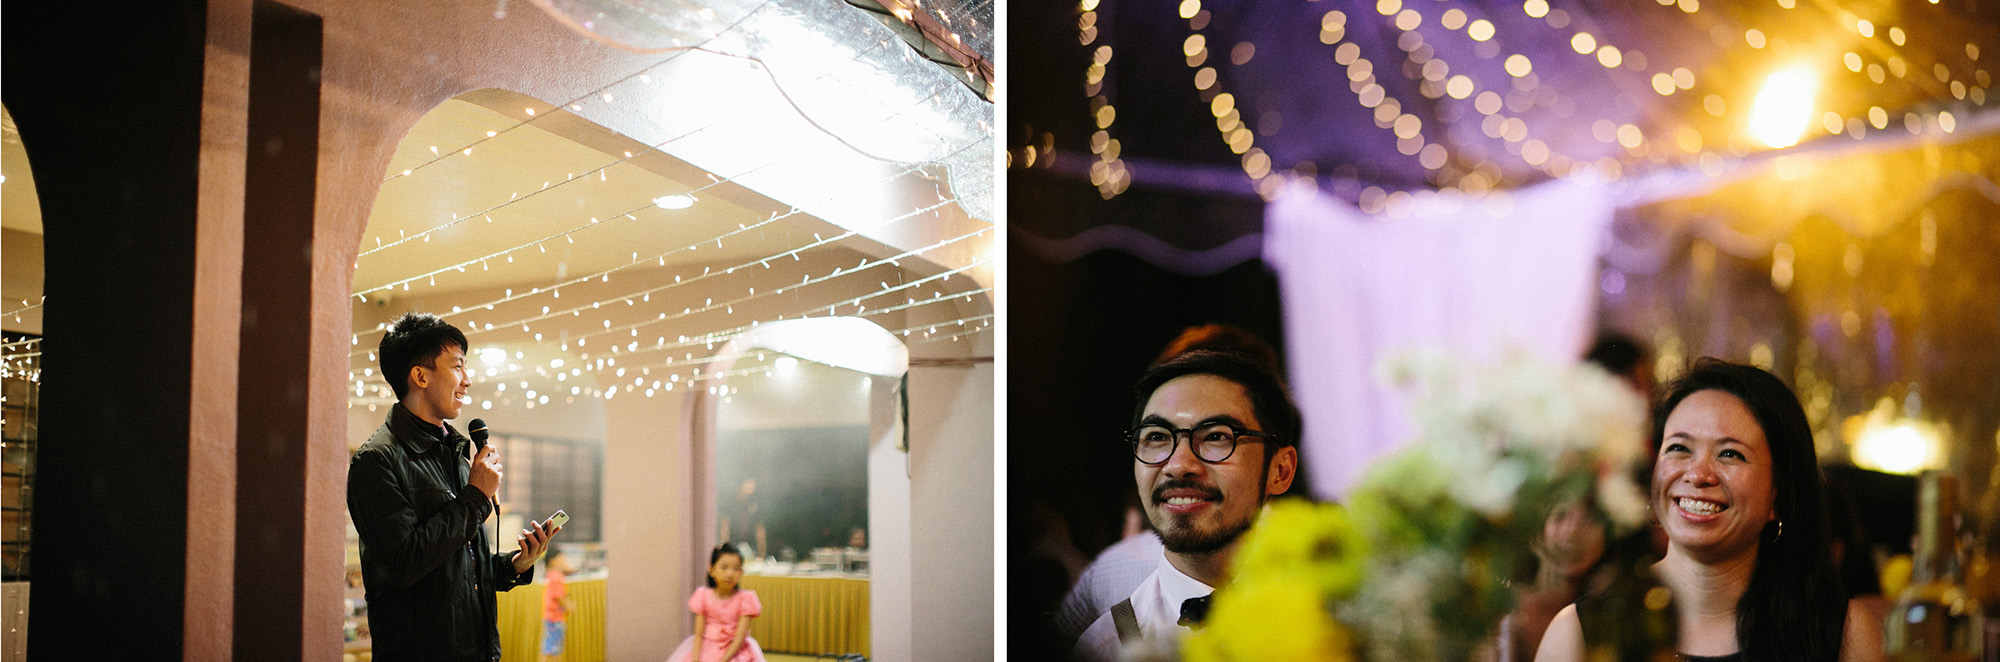 87-hellojanelee-sam grace-malaysia-wedding-day